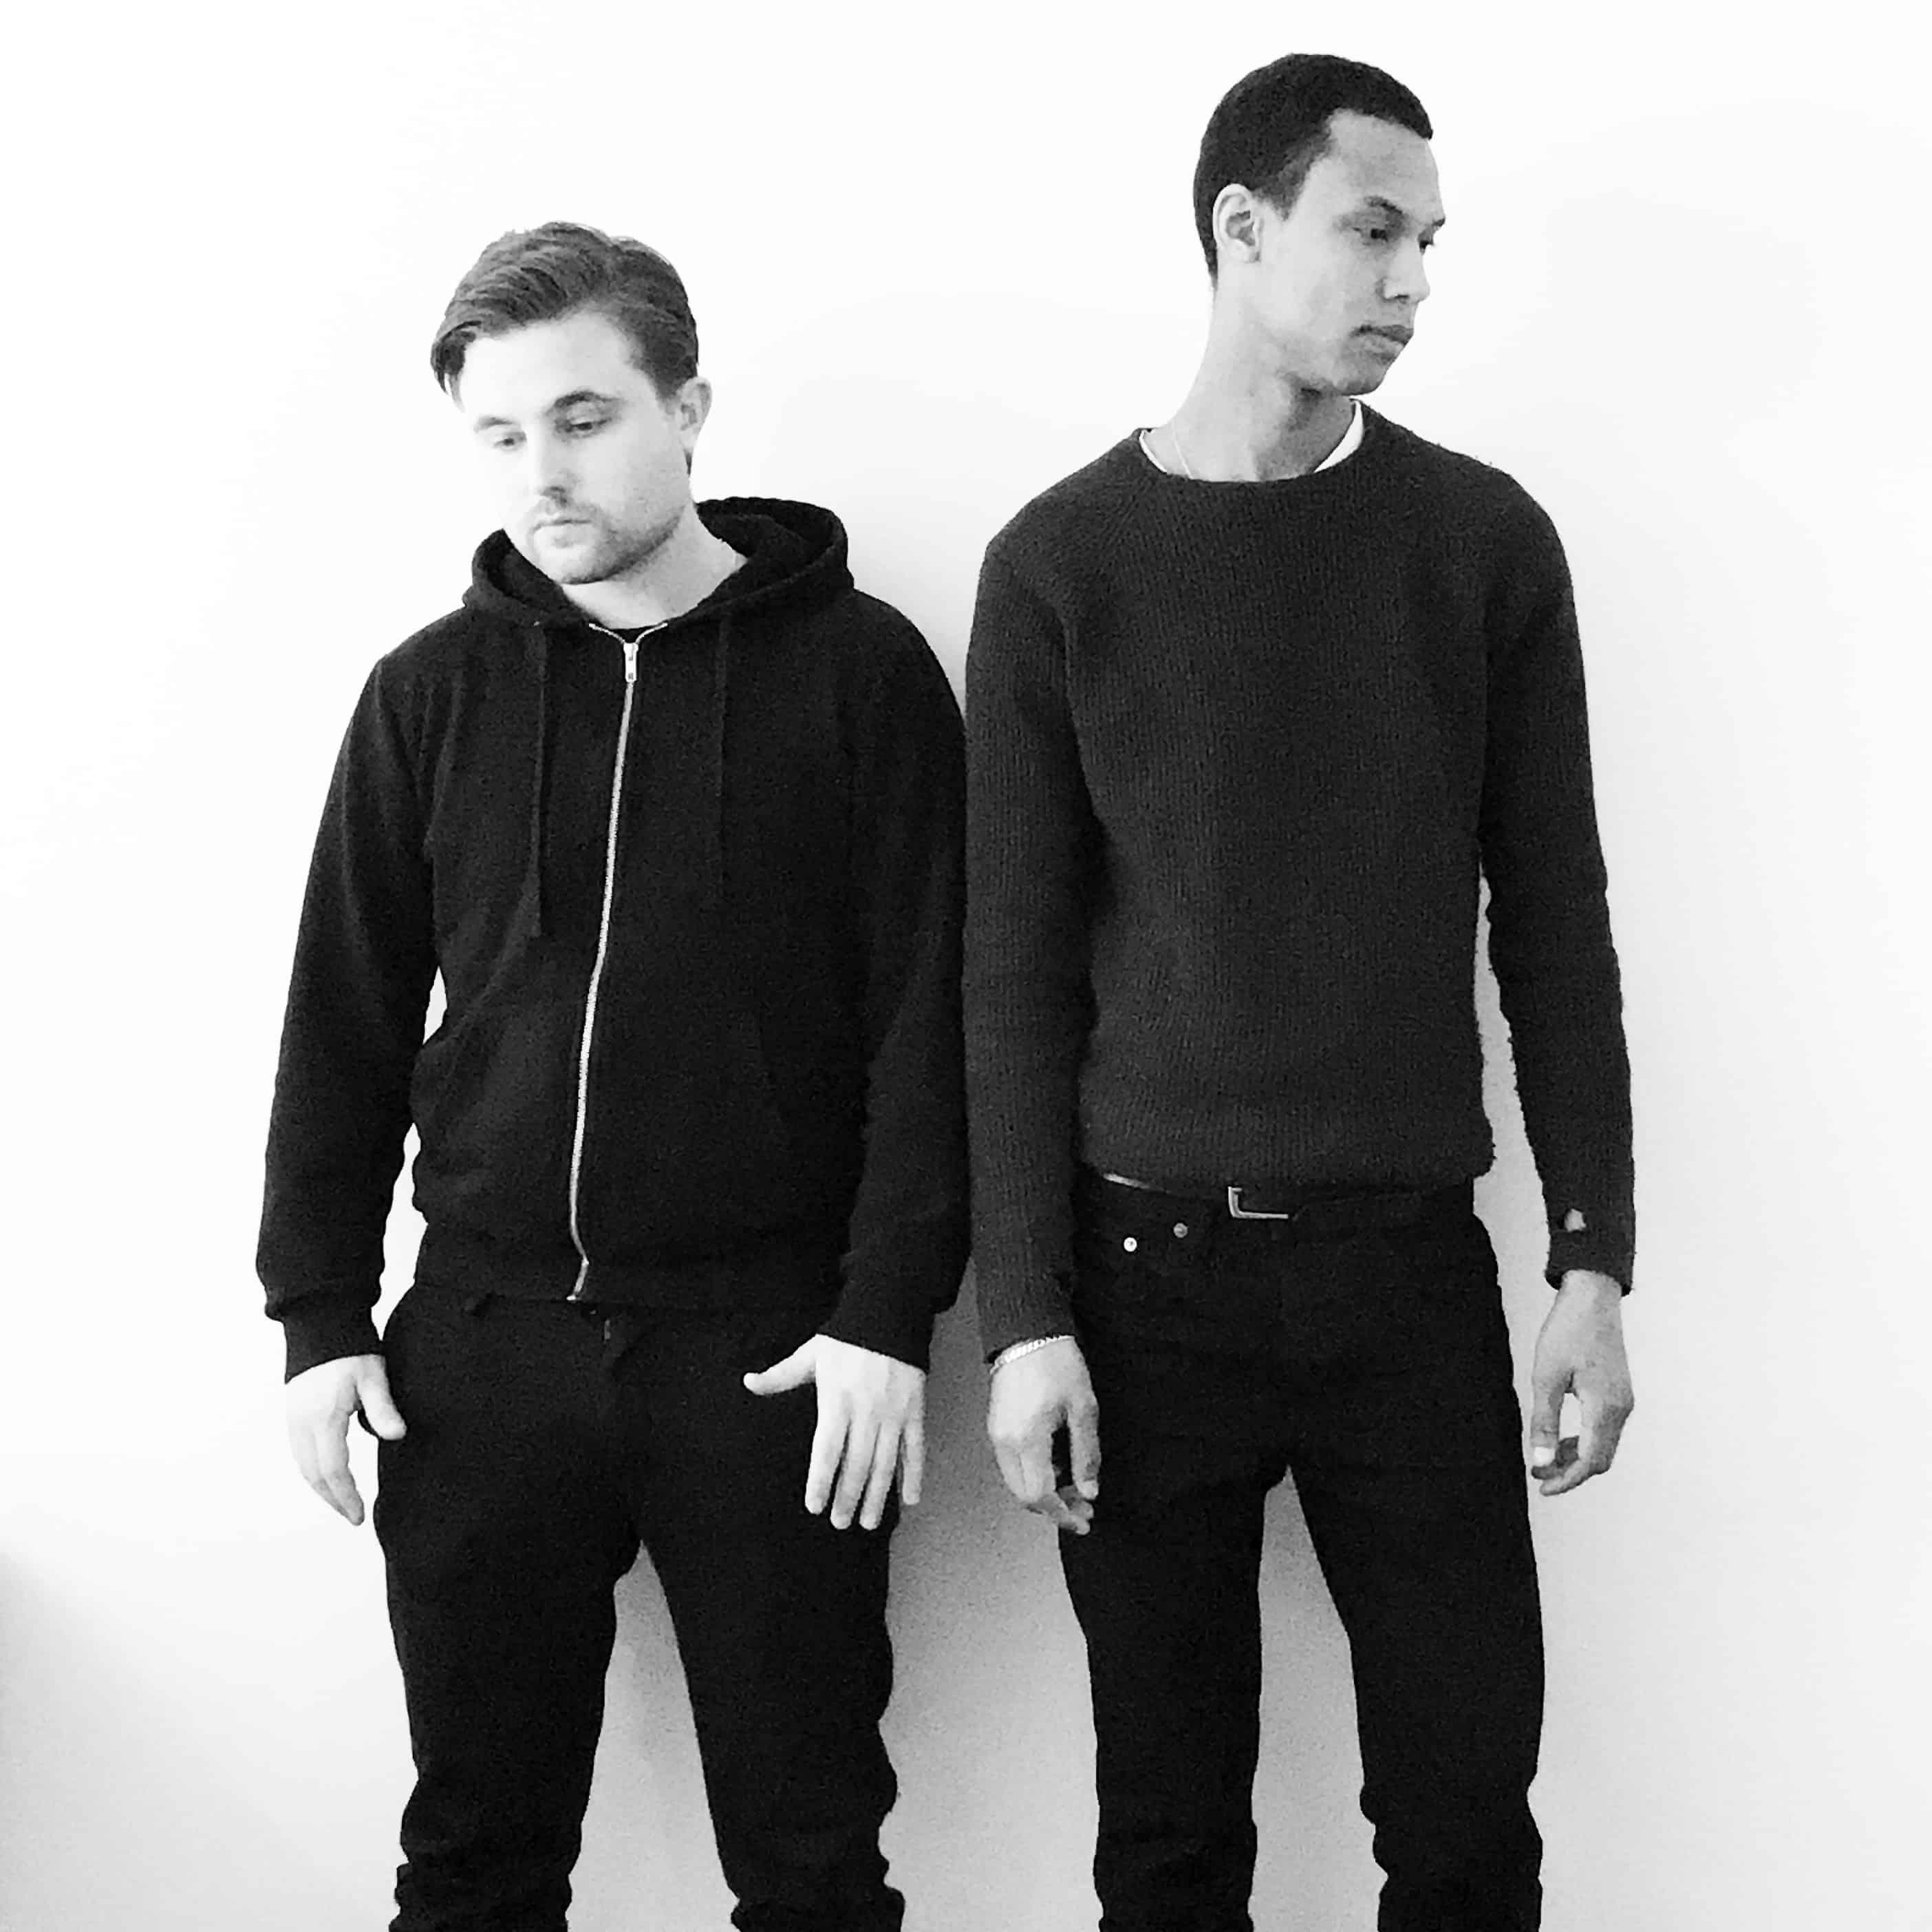 JADZ & KAERS Interview